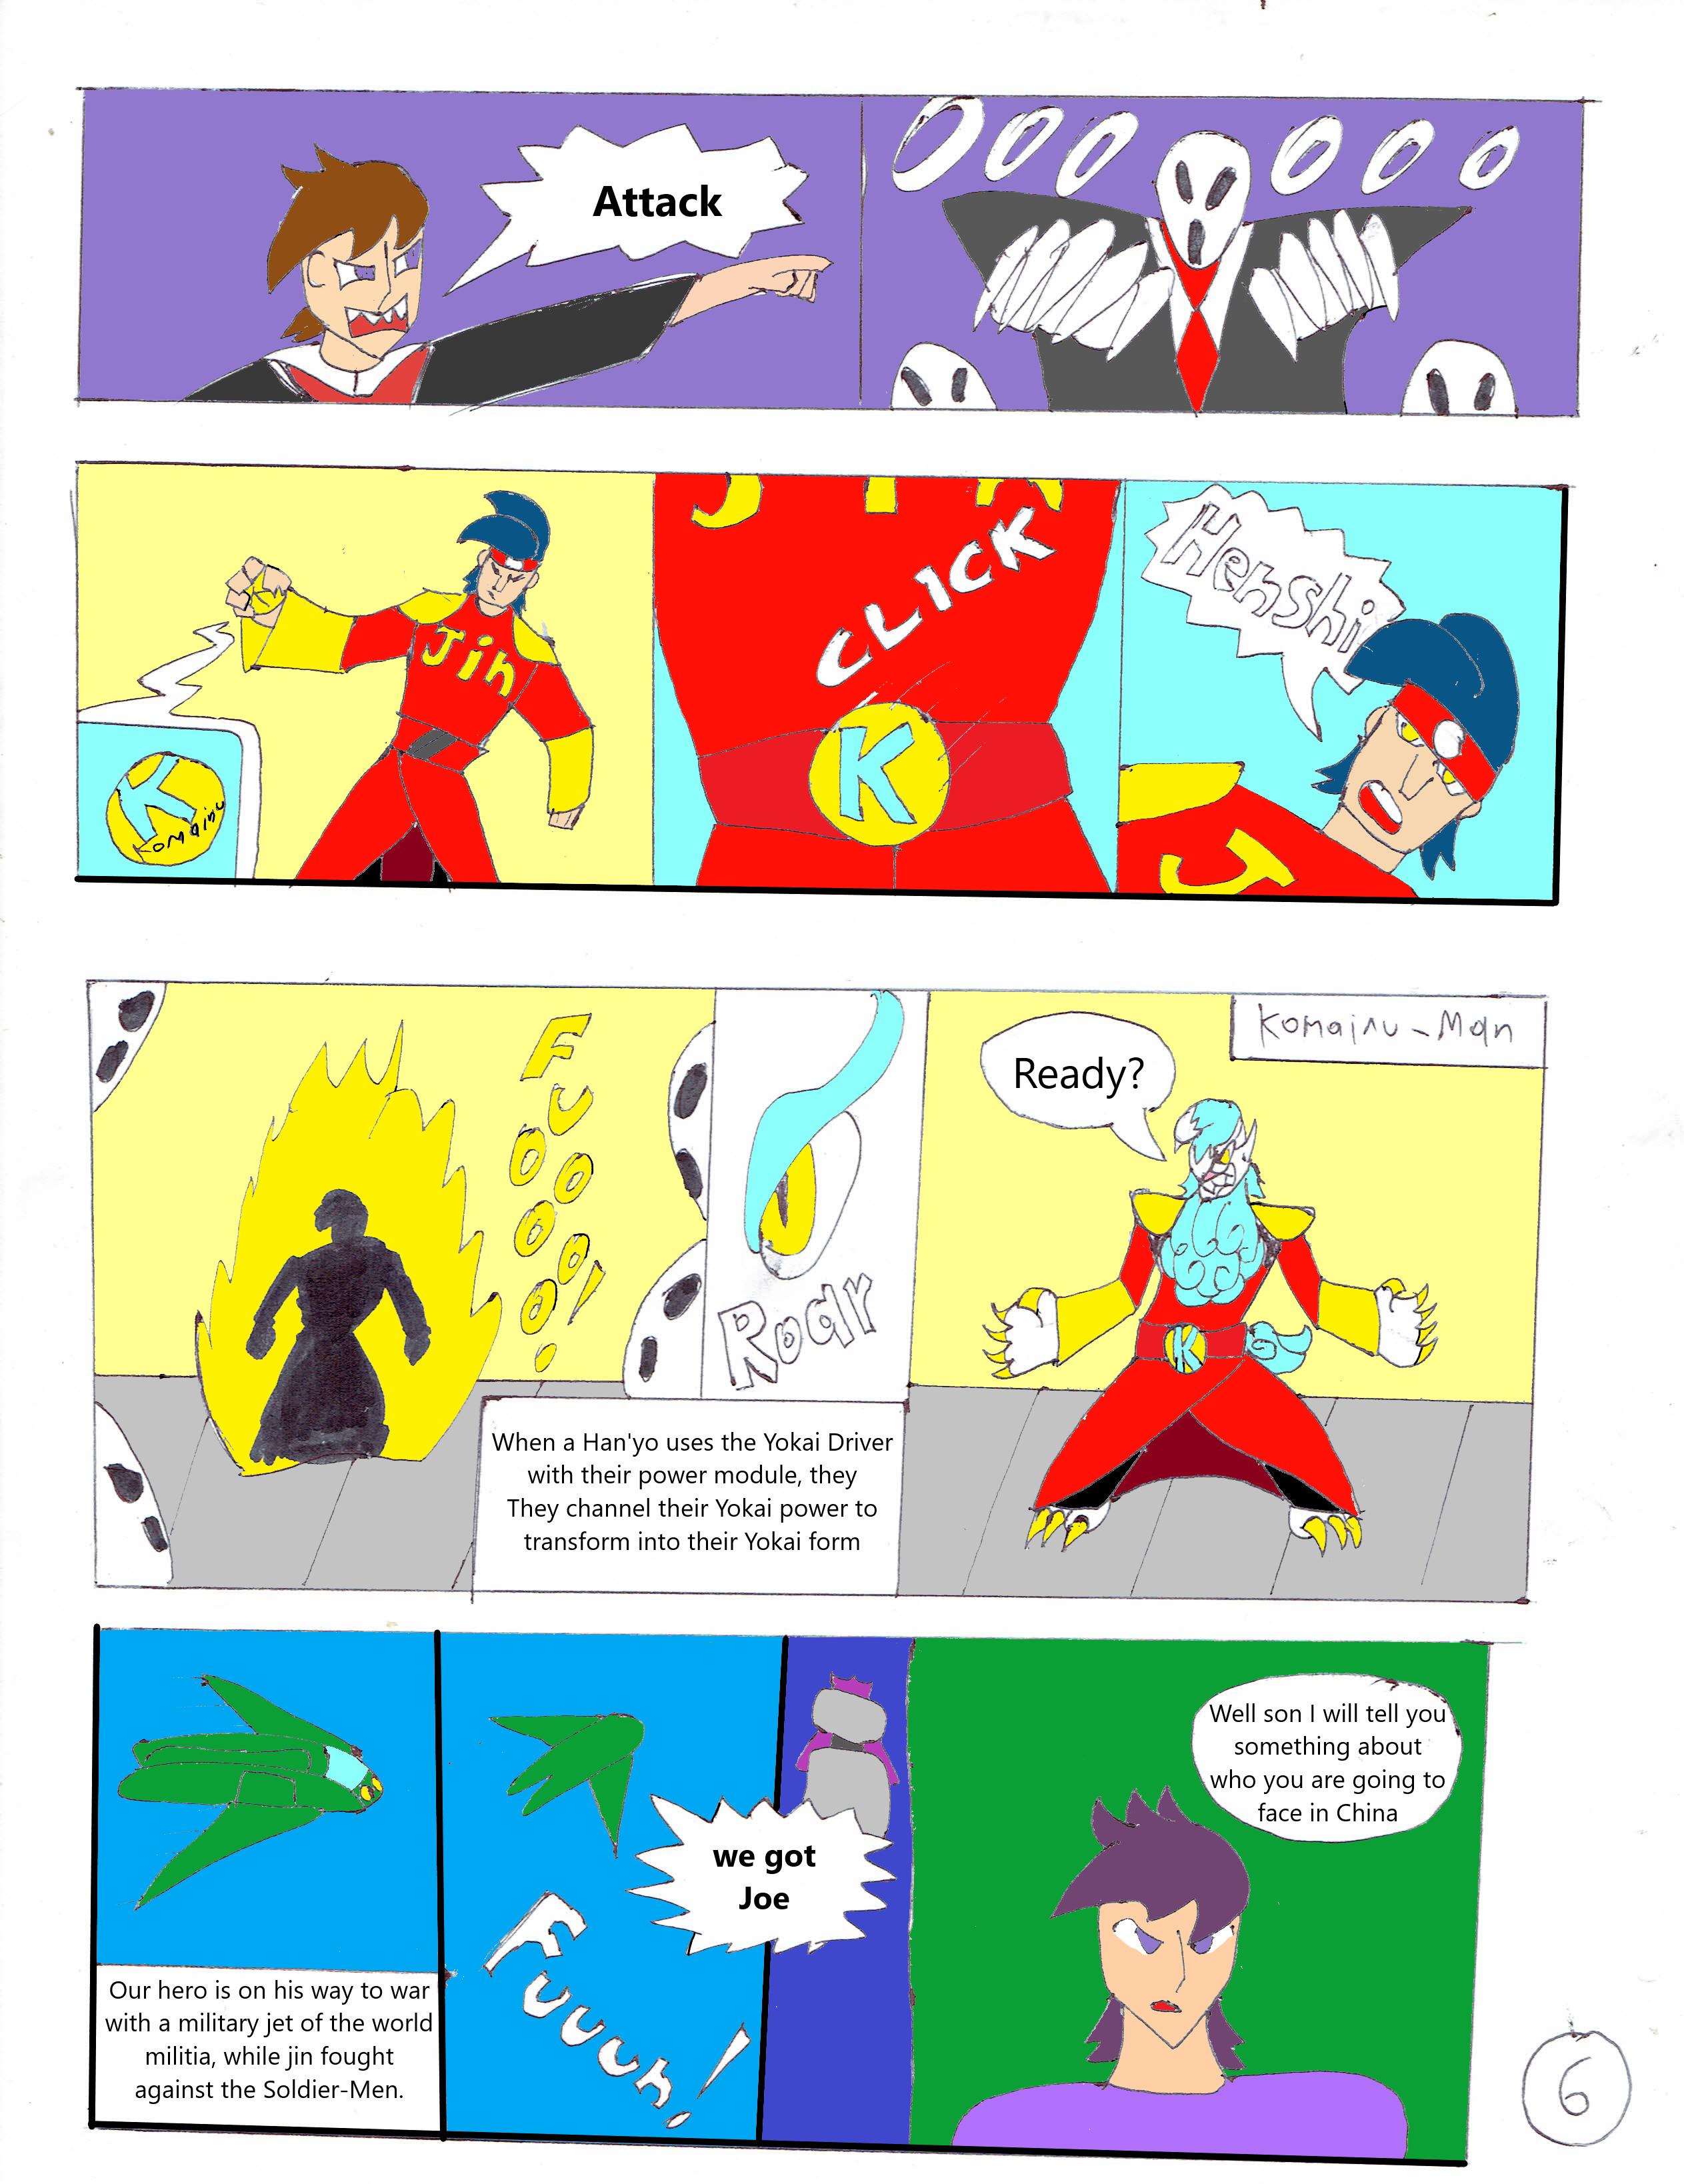 KyubiMan Chapter 1 part 2